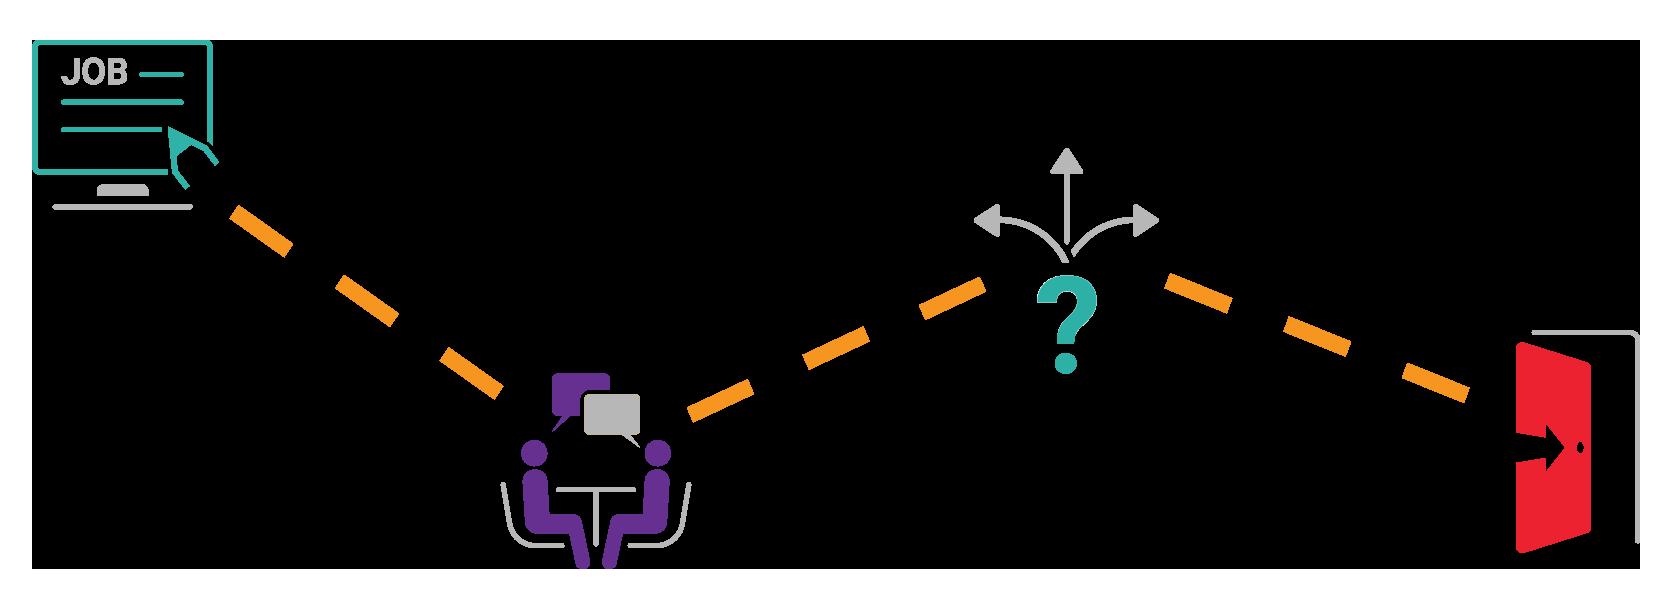 bis-journey-hiring-map